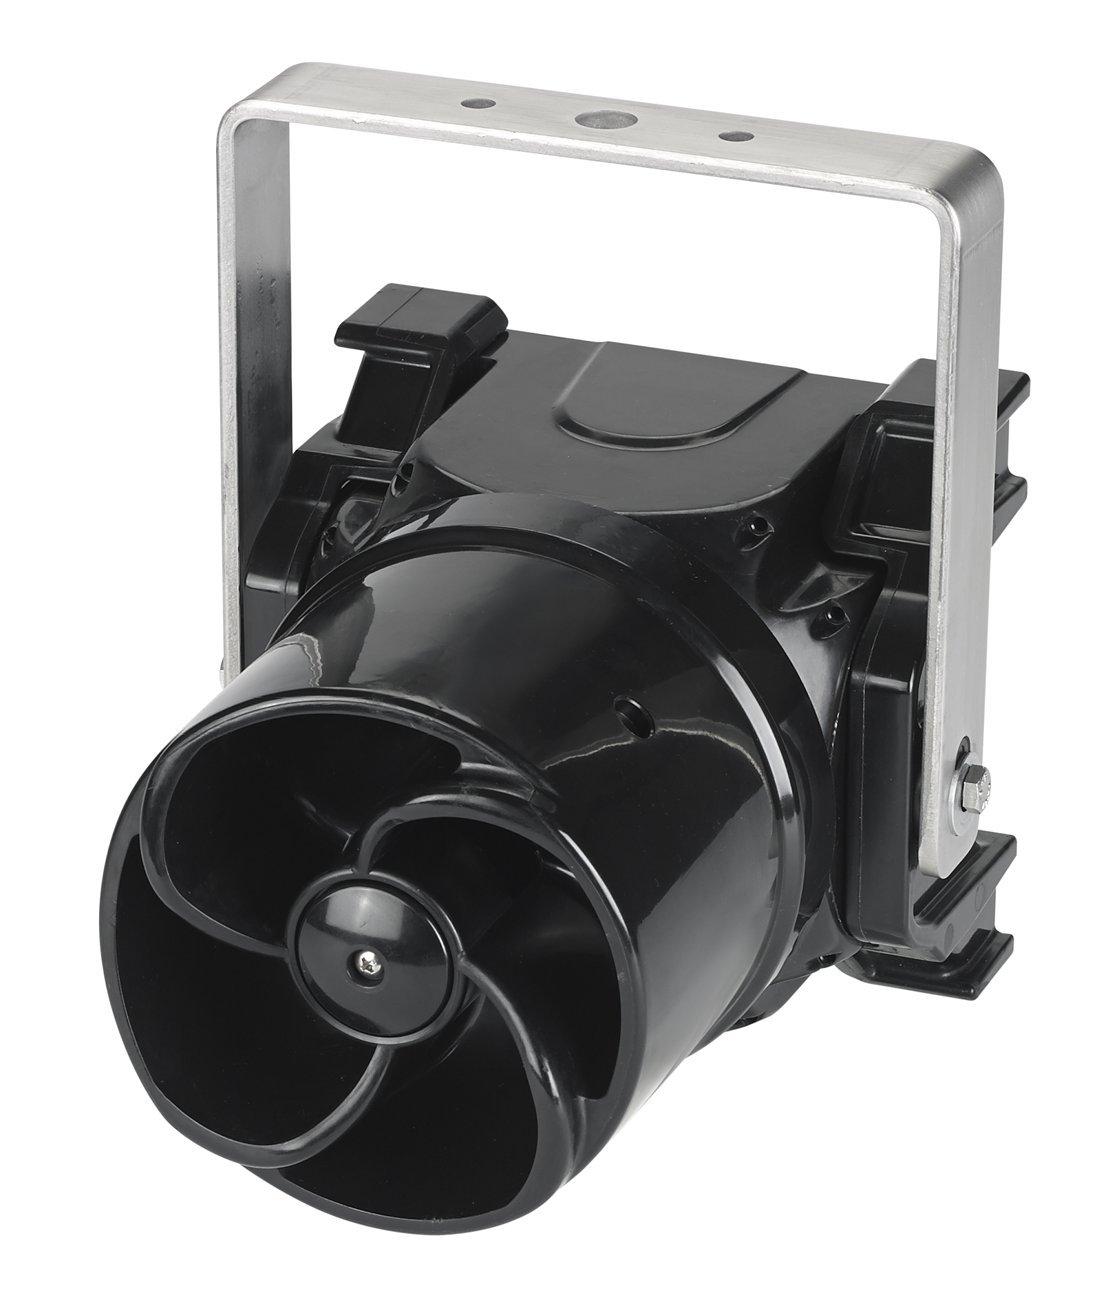 Federal Signal G-SND-MV-T Global Series Sounder, Multi-Tone, Multi-Voltage, U-Bracket Mount, Black